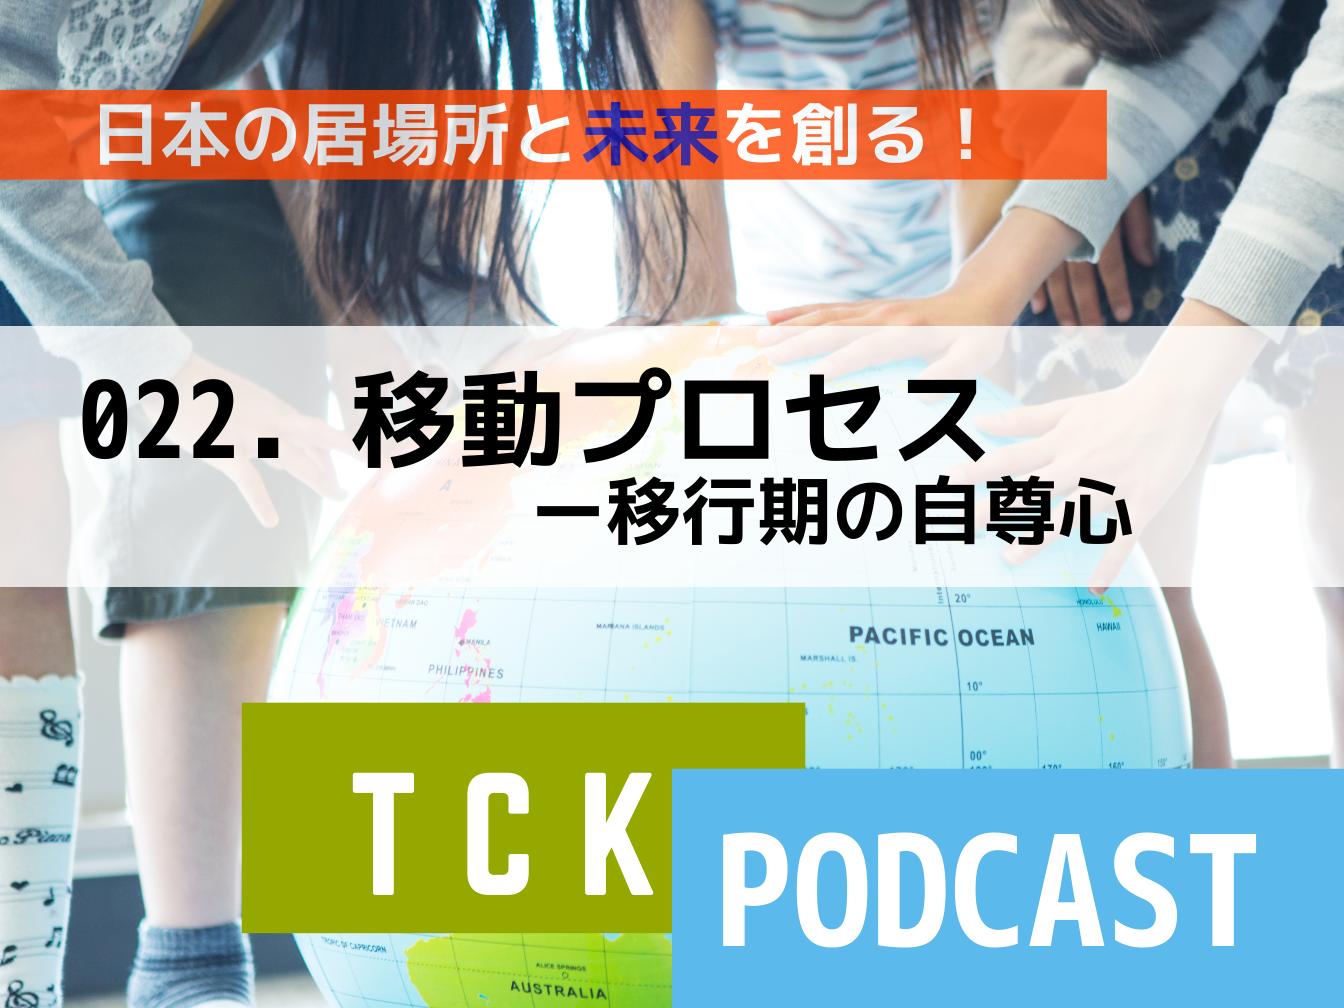 TCK-移動プロセス